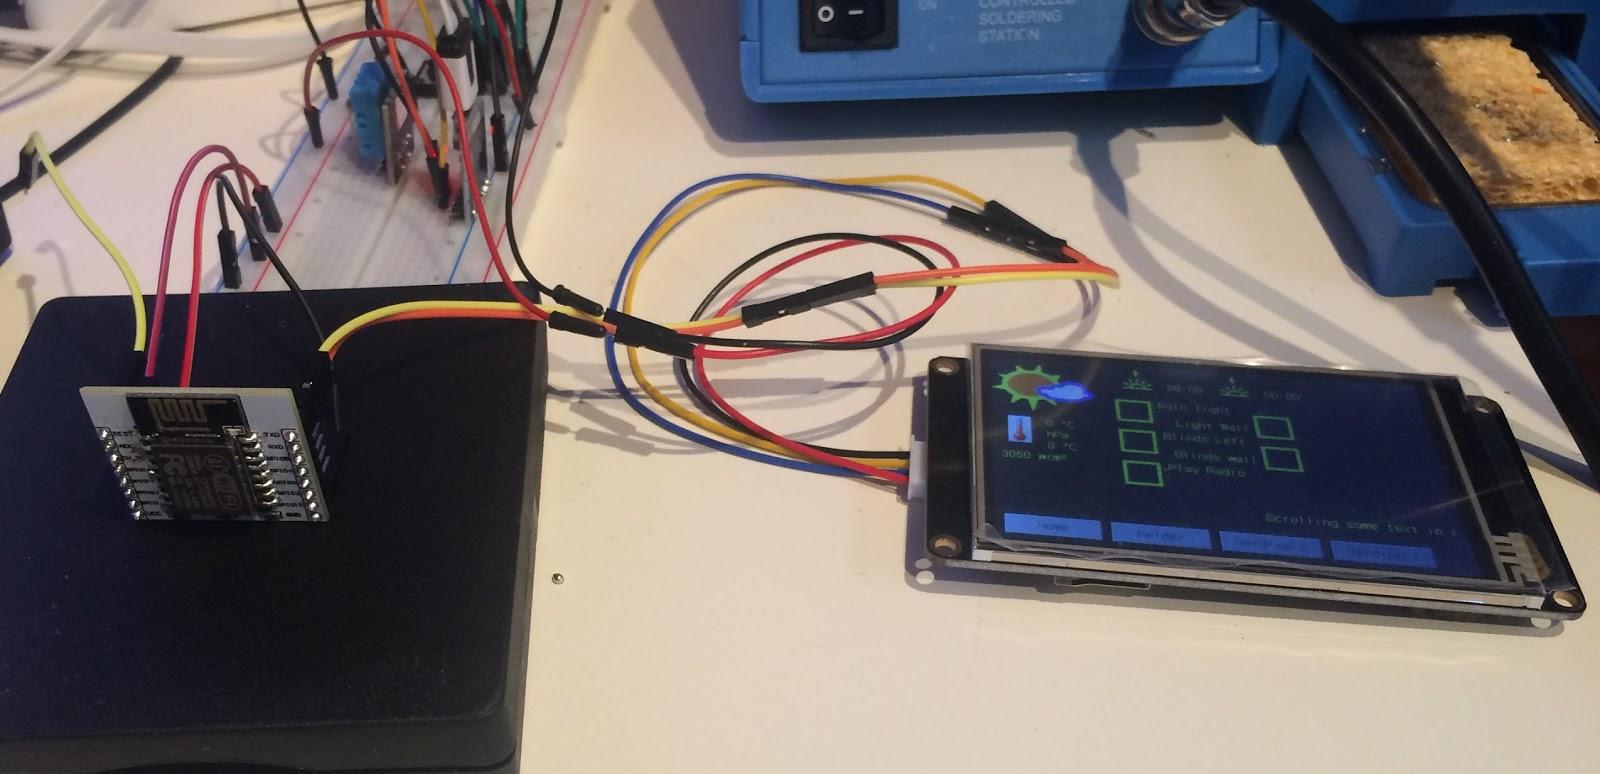 Nextion HMI - Domoticz on Raspberry - Let's Control It